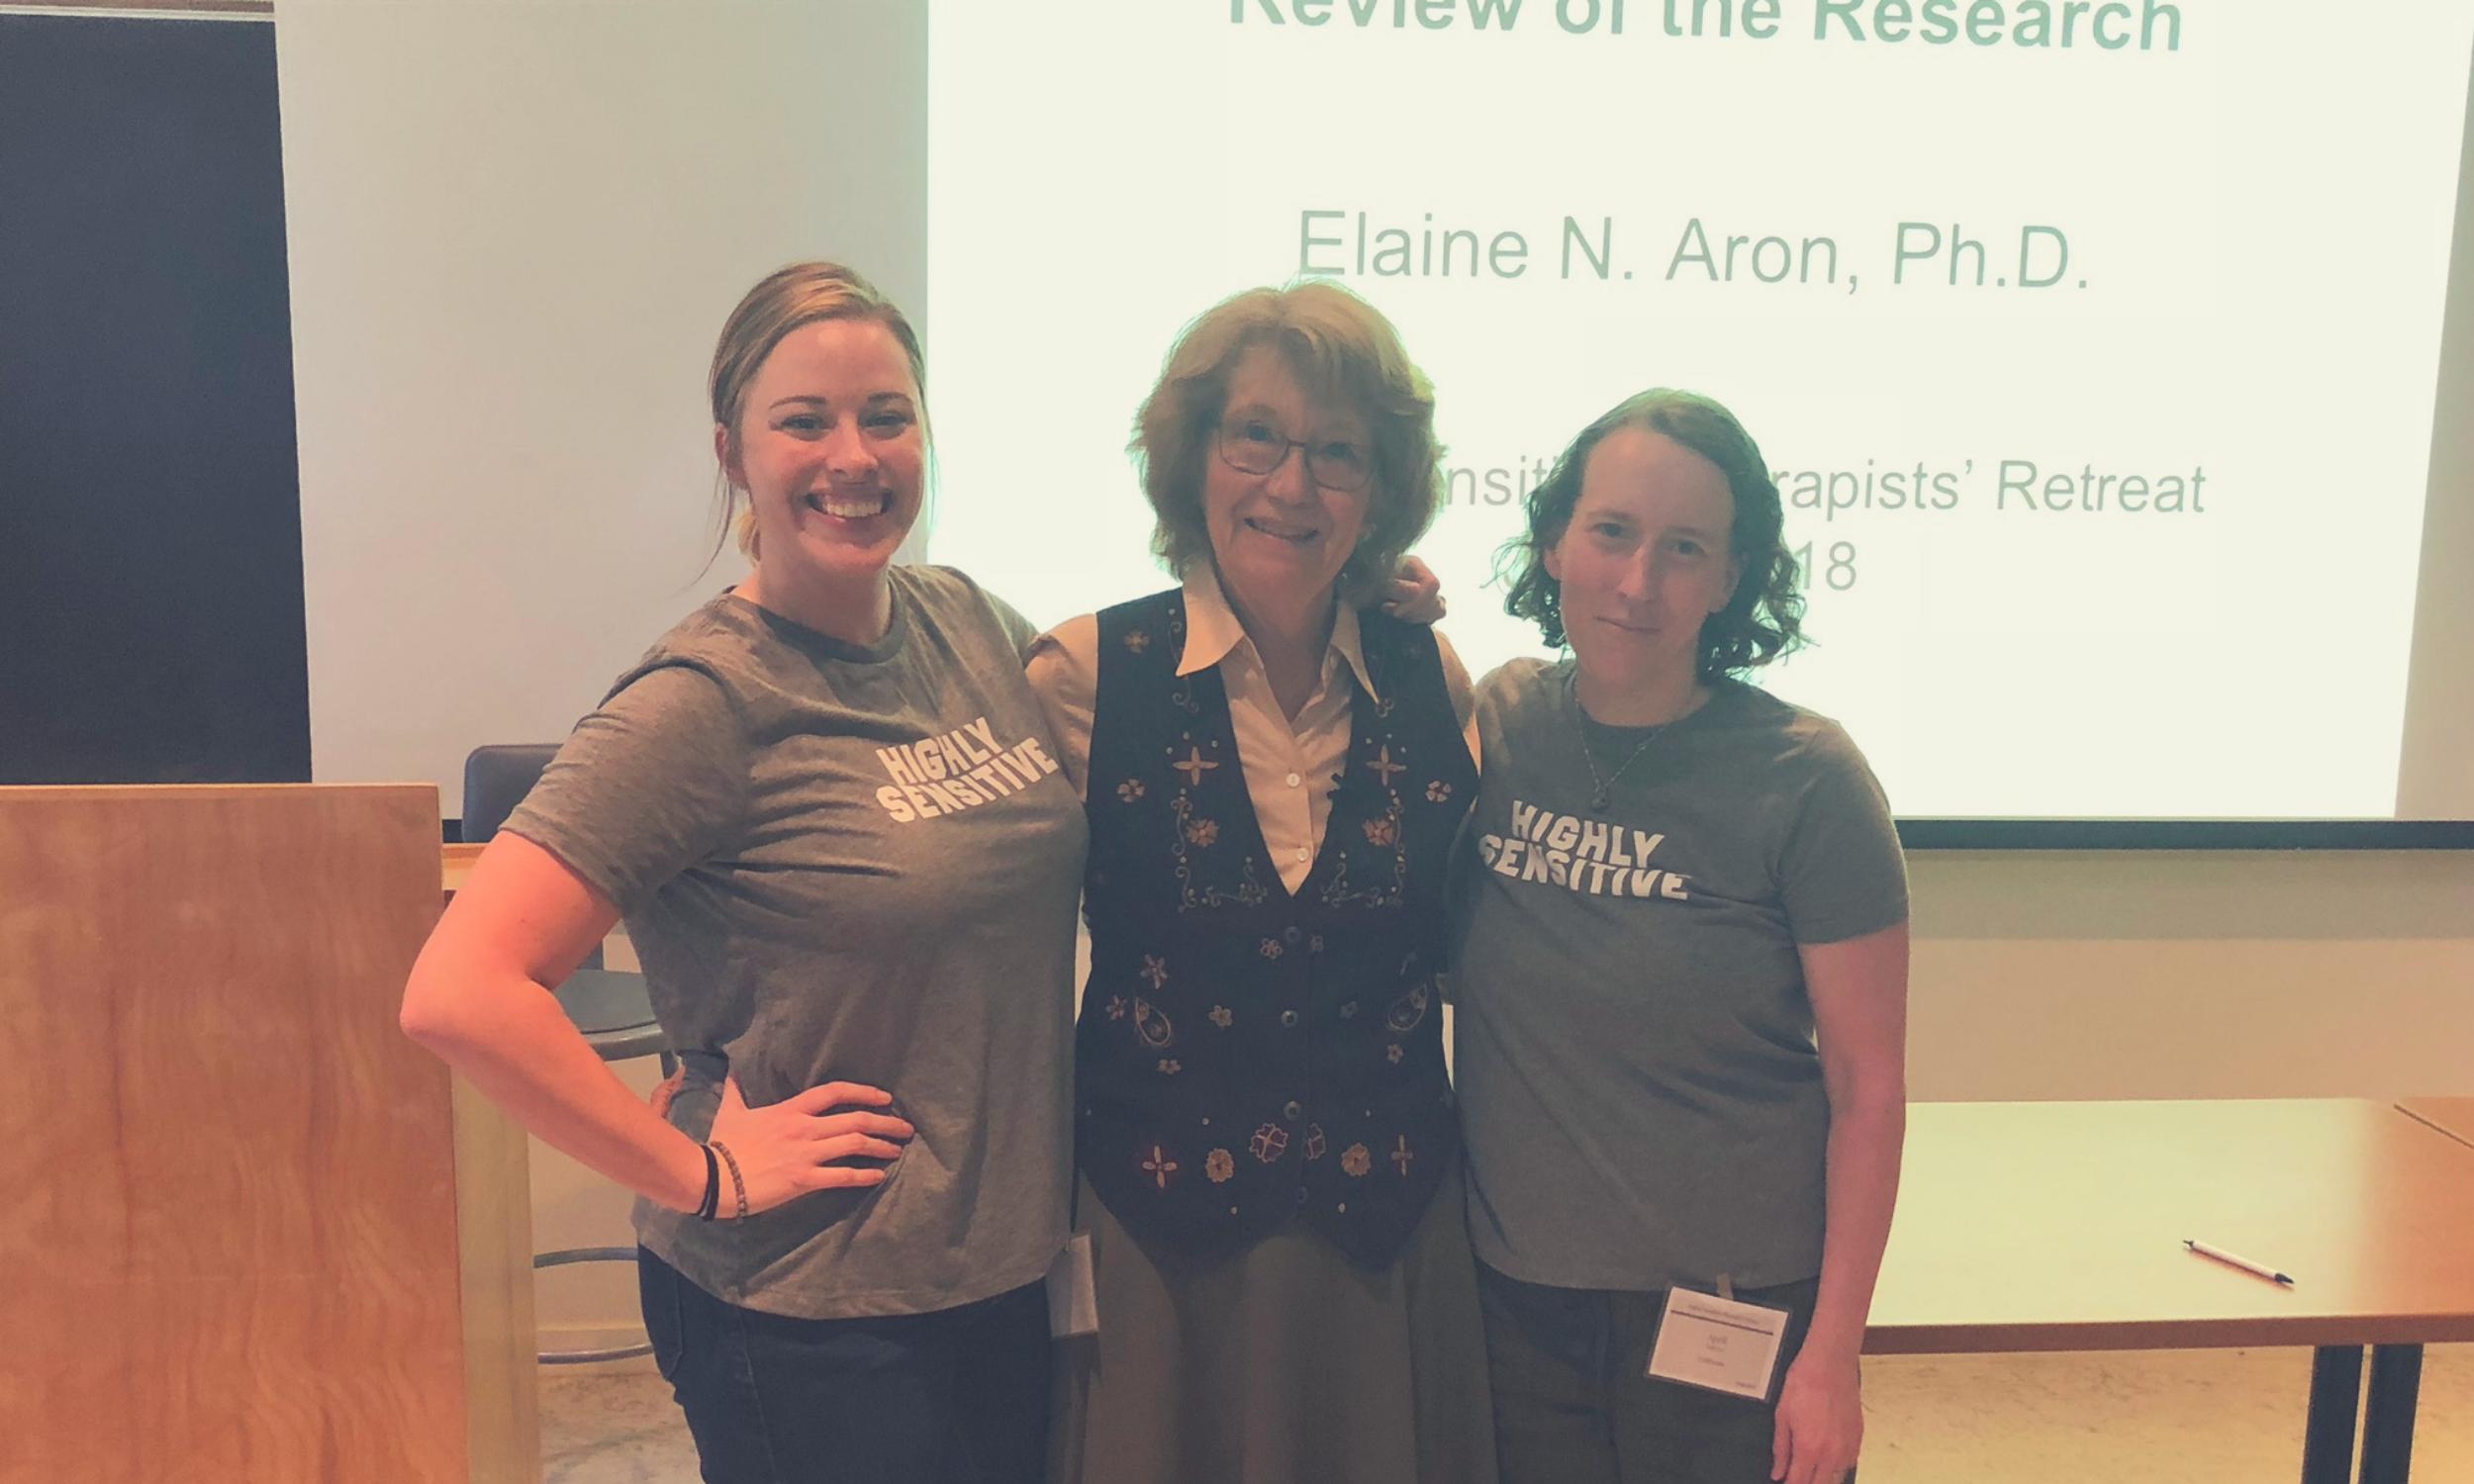 Highly Sensitive Therapist Retreat Dr. Elaine Aron